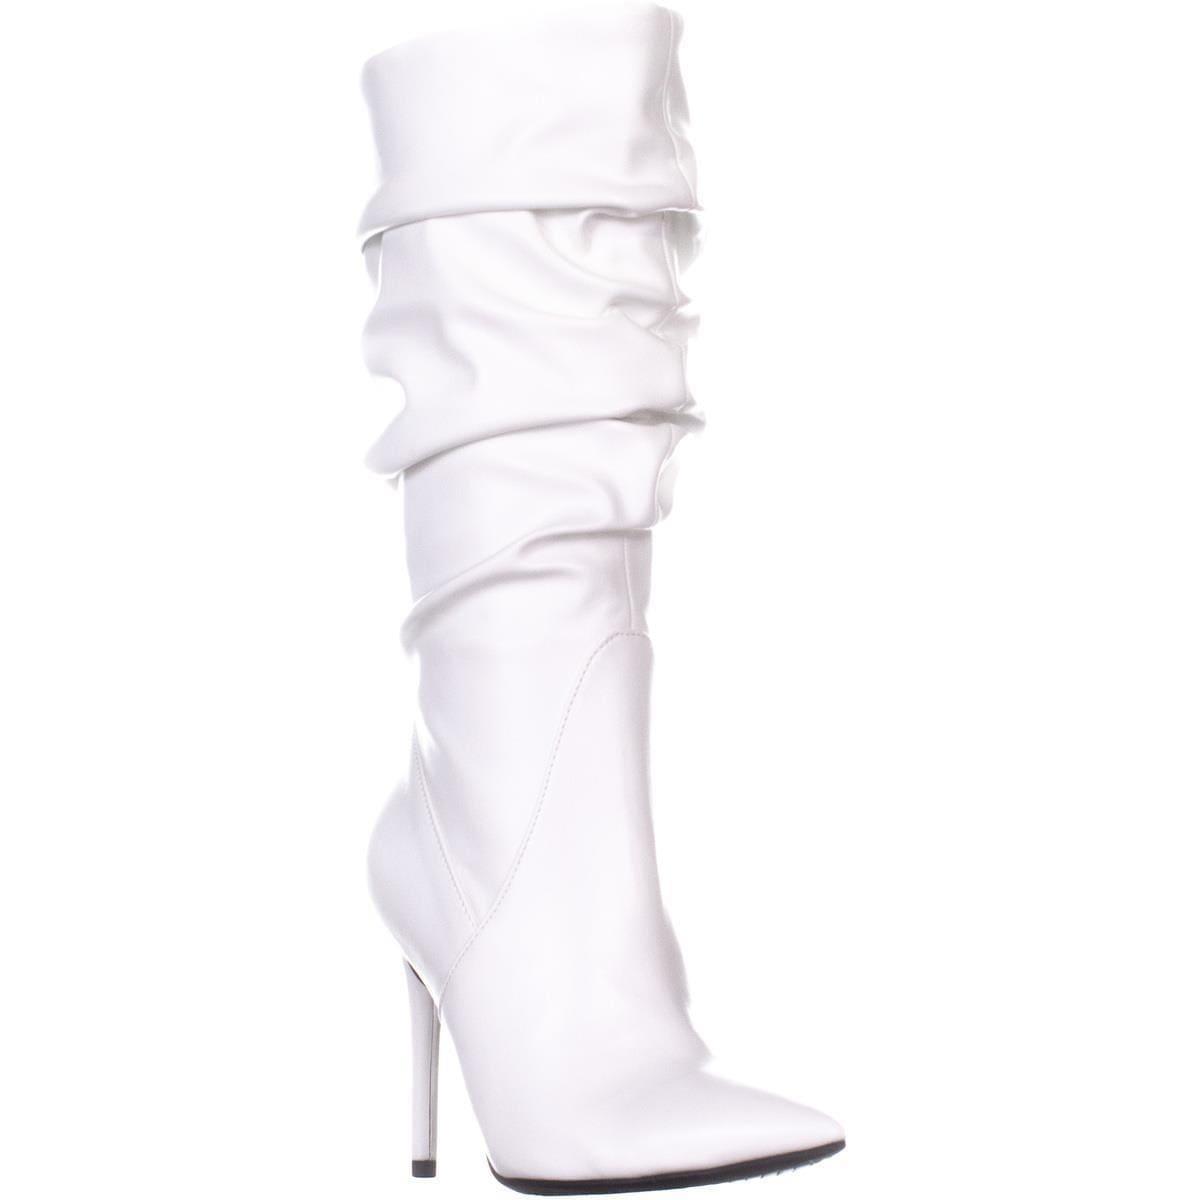 Jessica Simpson Lyndy 2 Knee High Boots